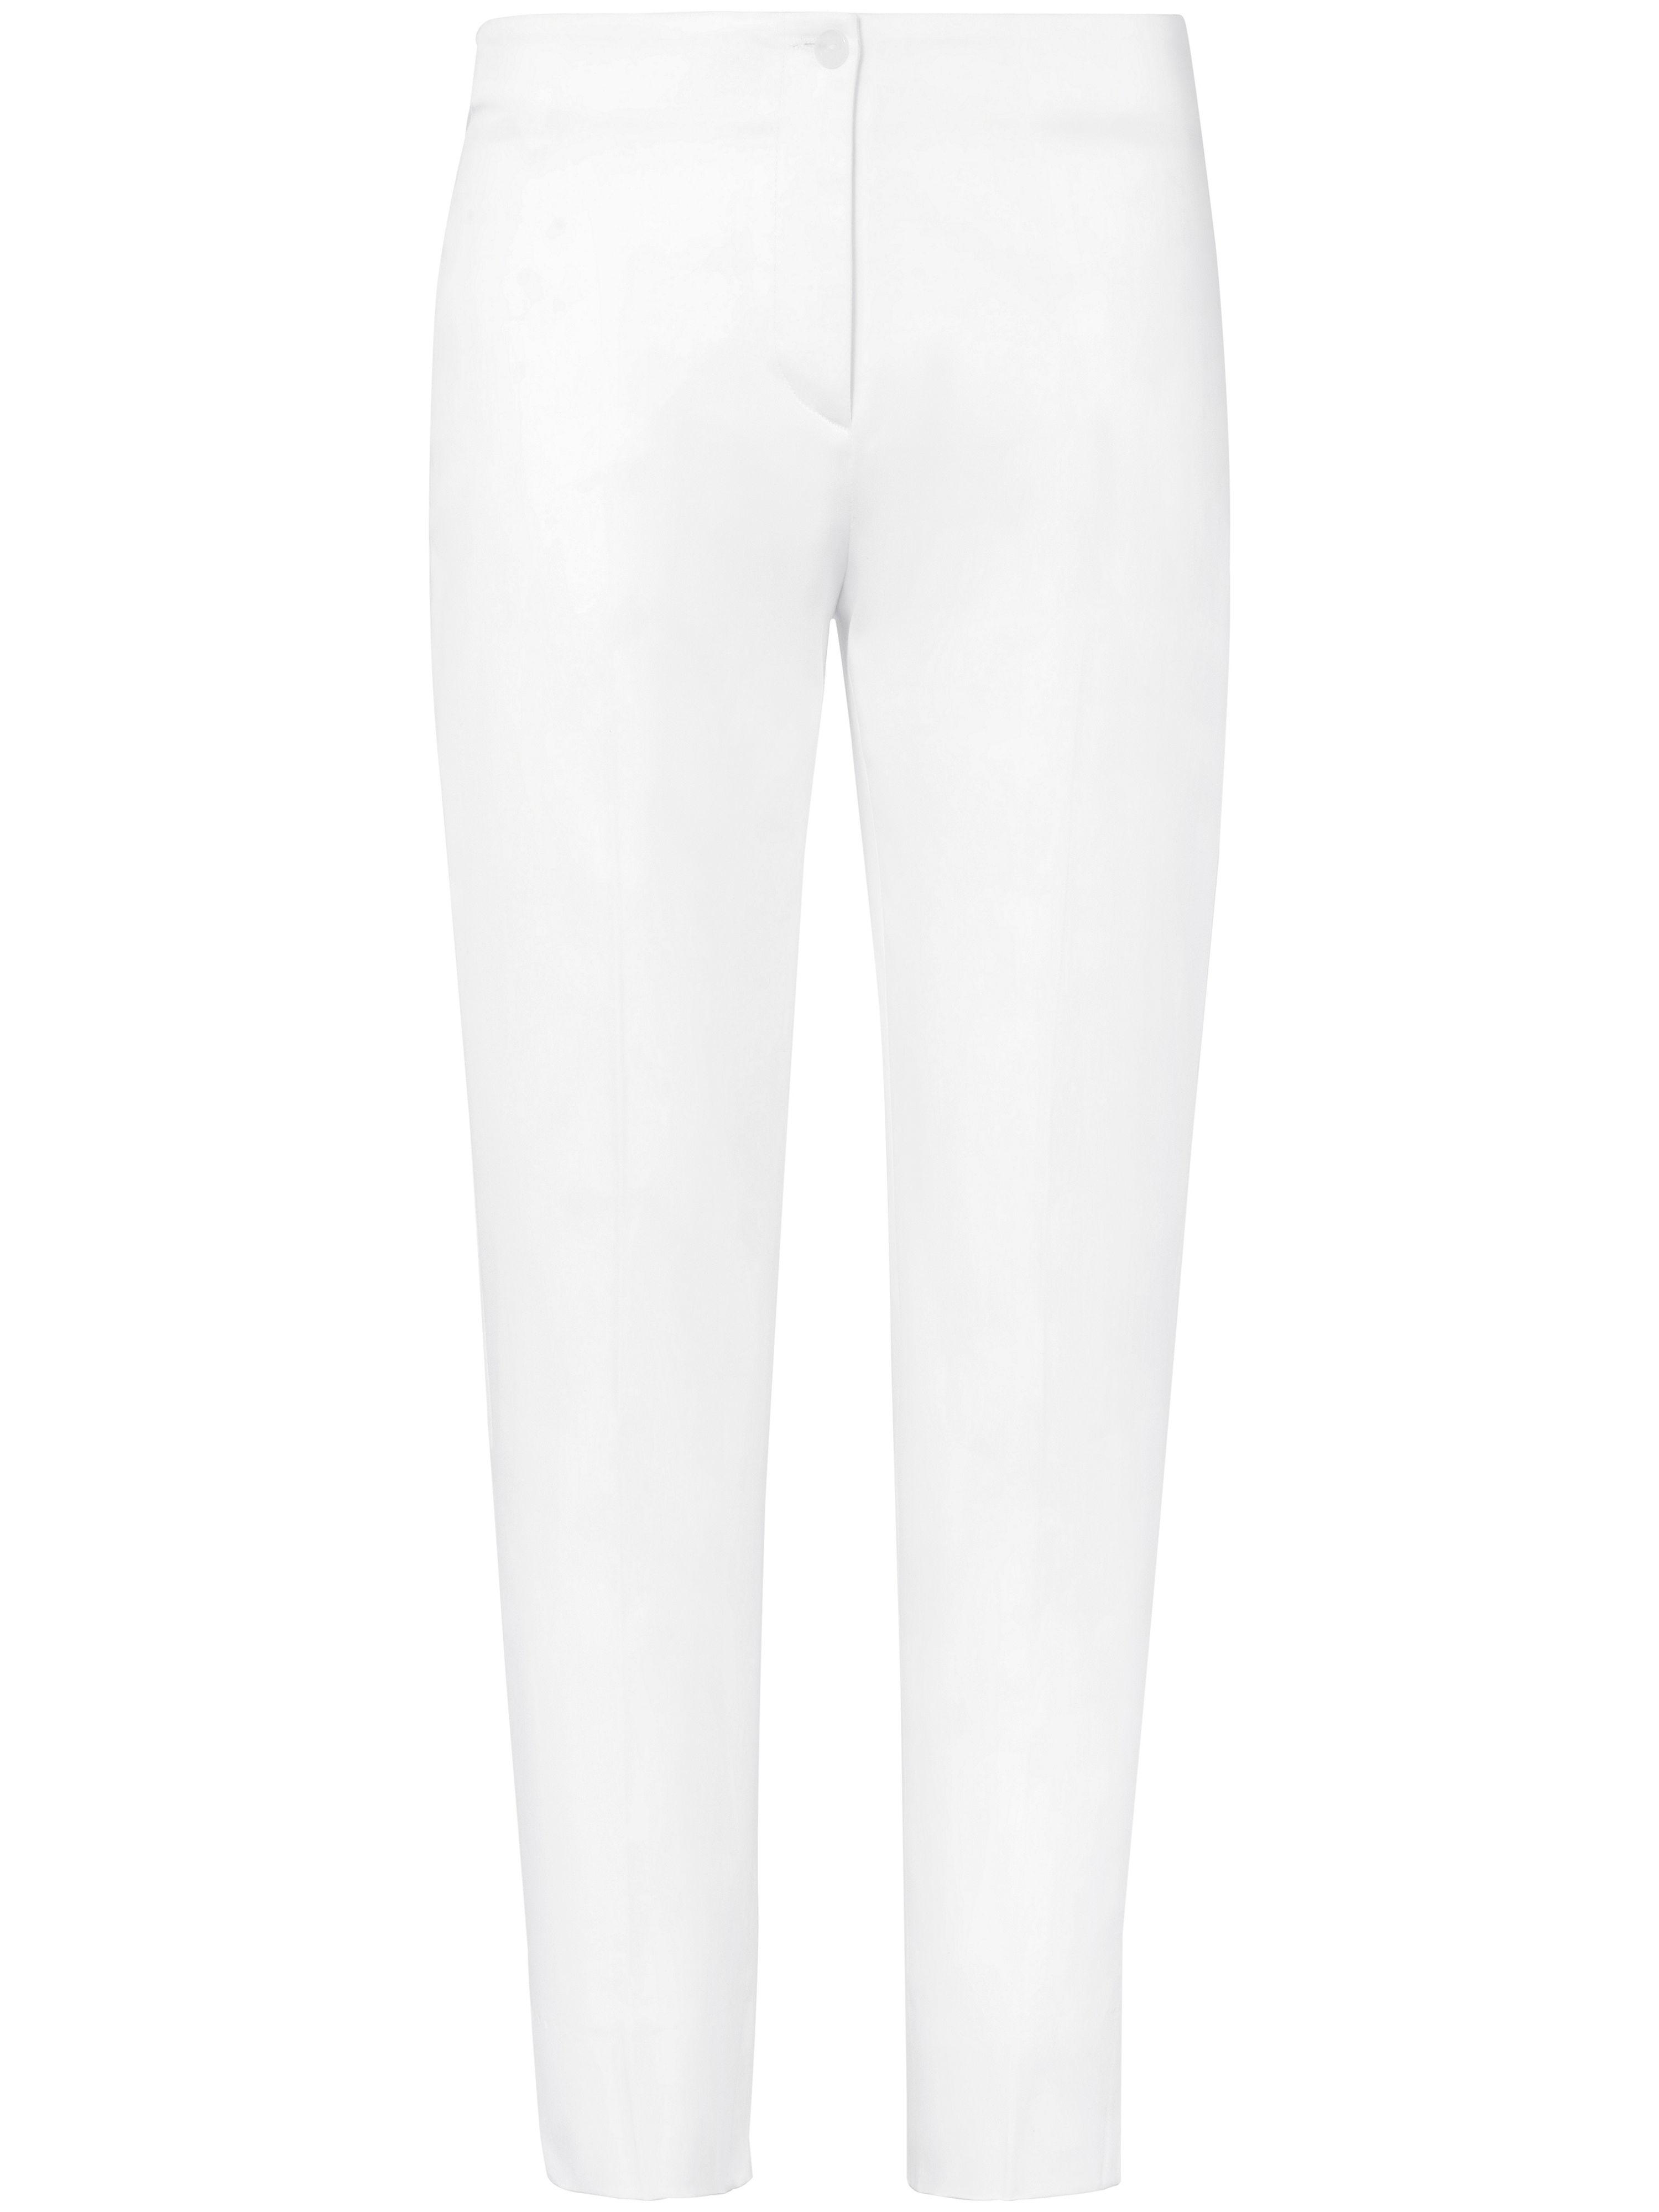 Le pantalon 7/8 coupe Barbara  MYBC blanc taille 24